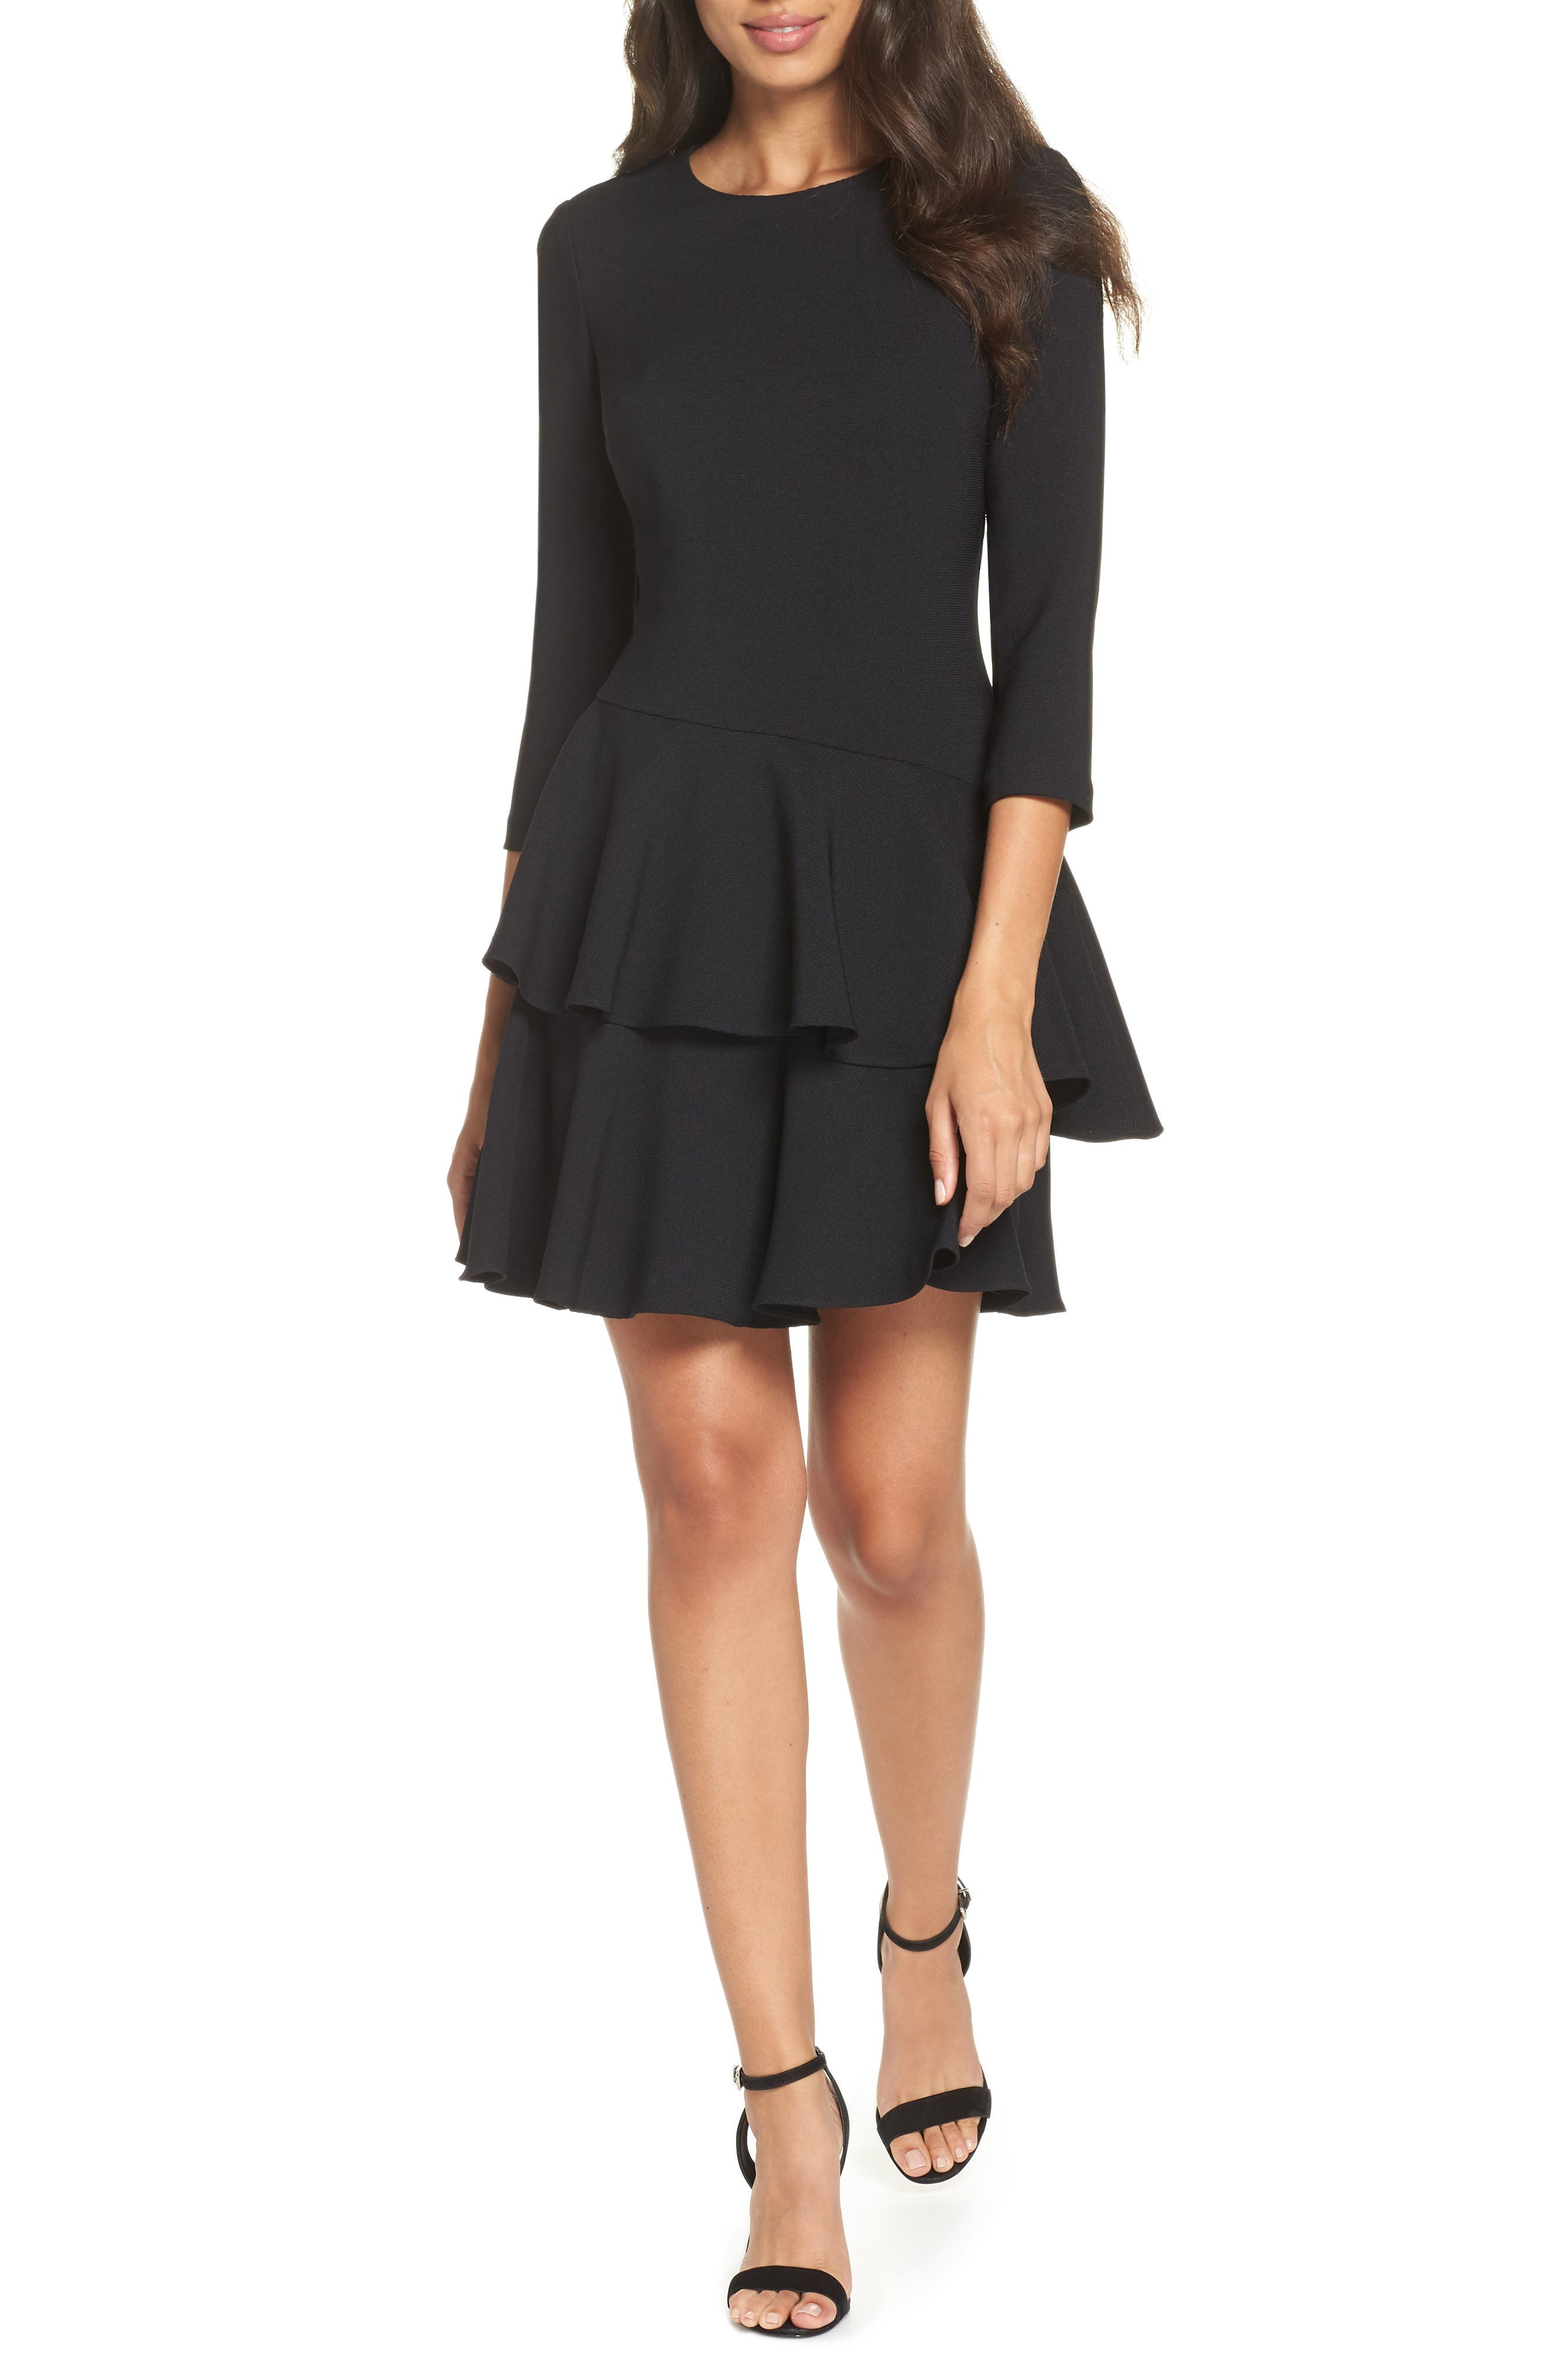 ELIZA J, Tiered Ruffle Knit Dress, Main thumbnail 1, color, 001